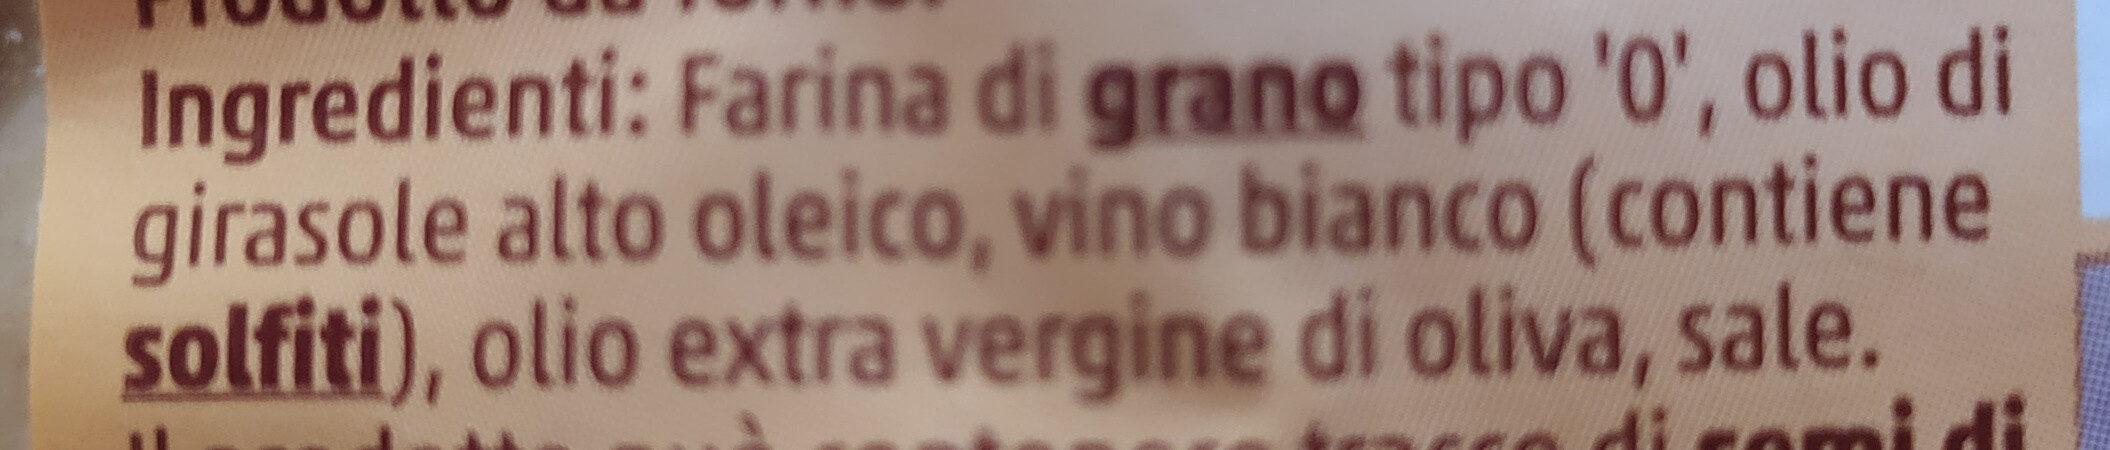 Gustoselli fragranti - Ingredients - it